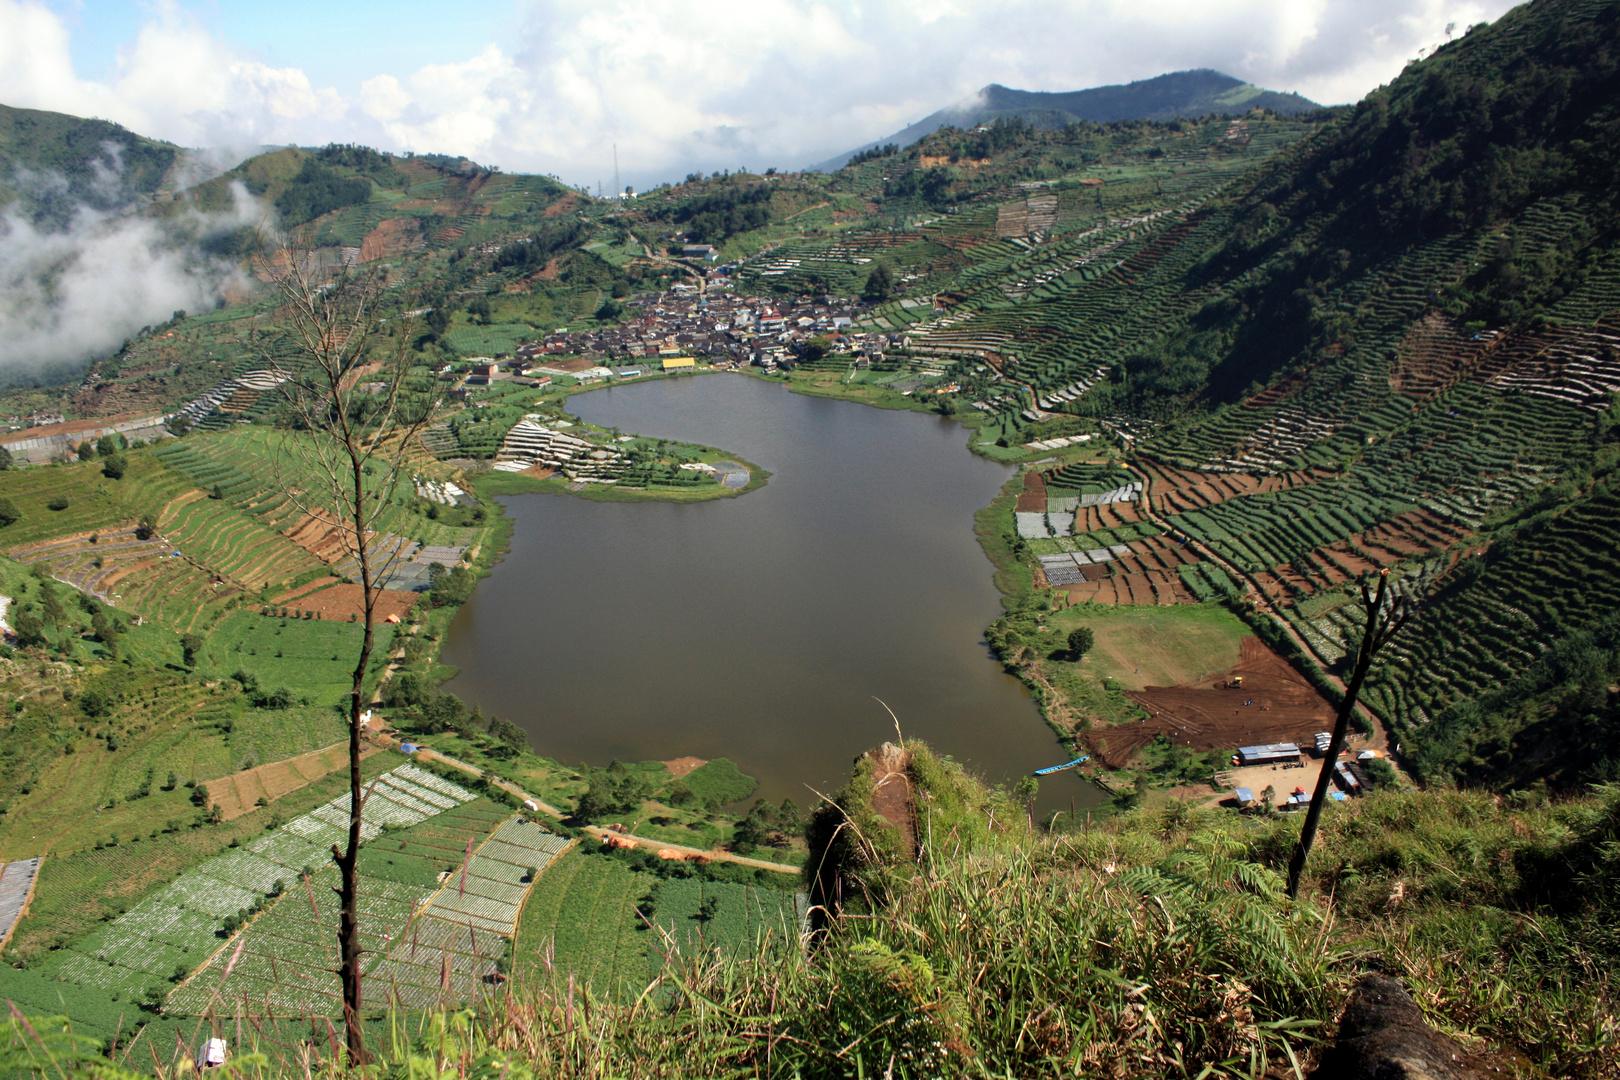 Telaga Cebong, the lake above the clouds